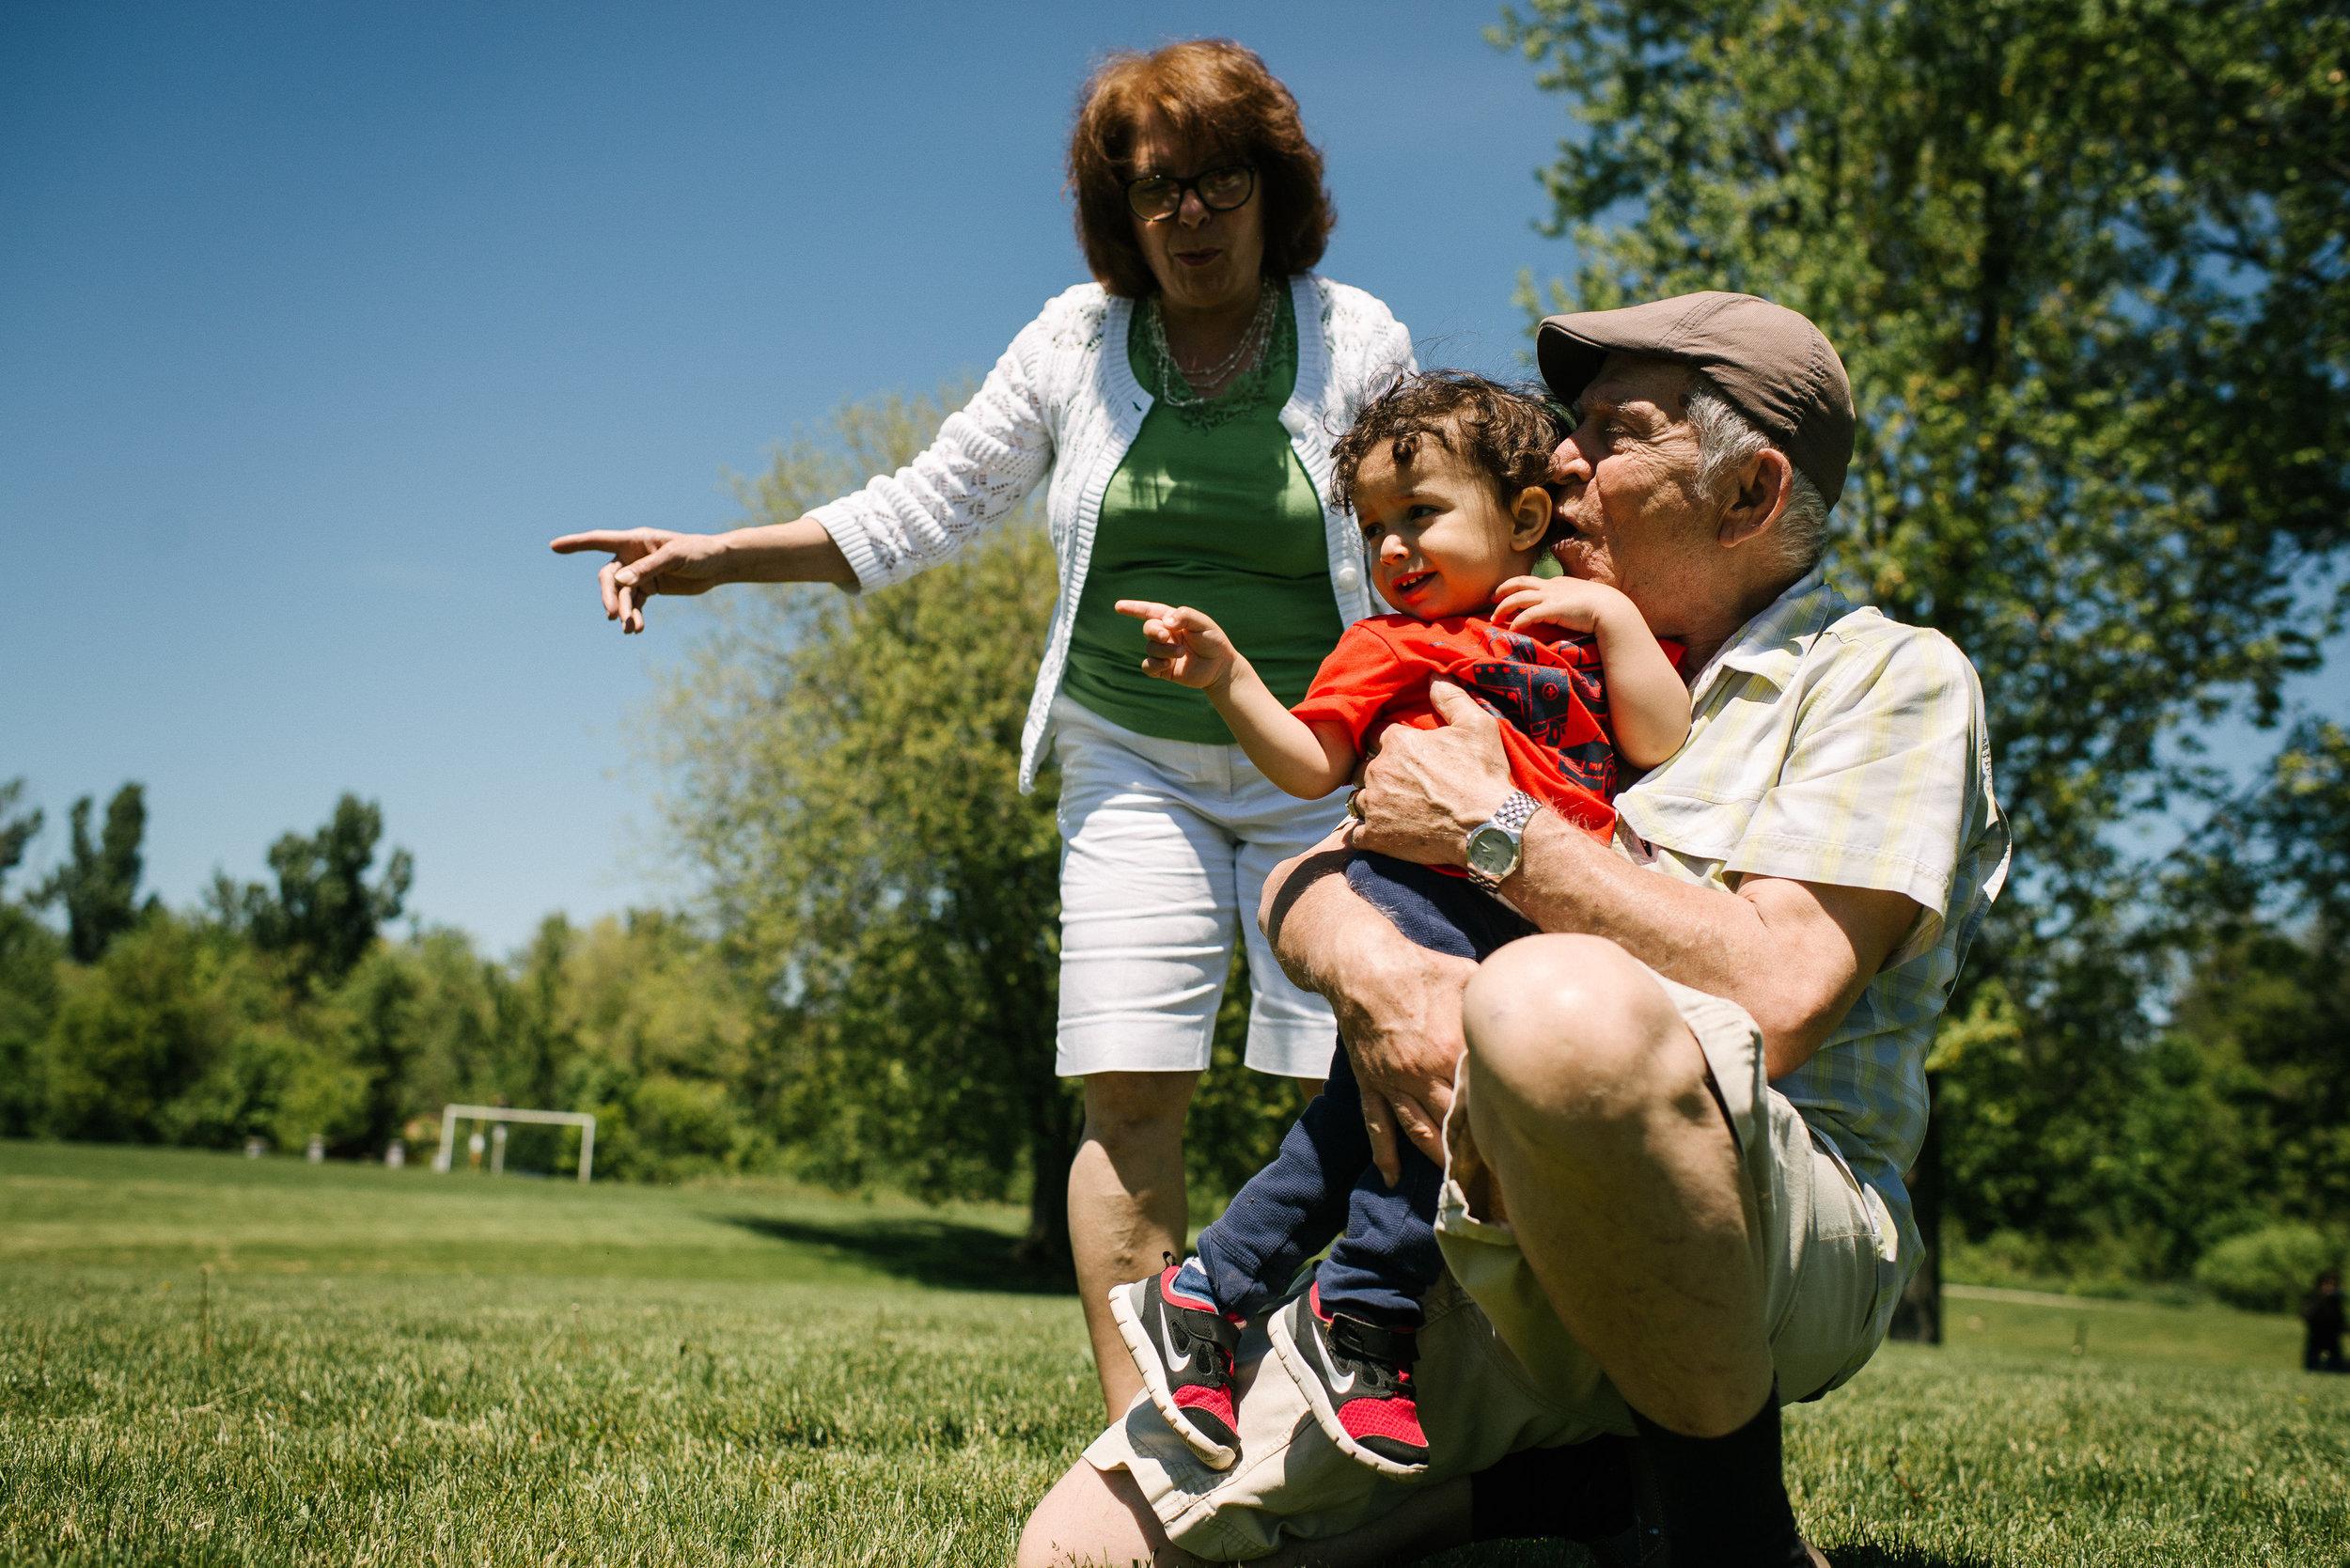 family documentary photography brampton -141727vm.jpg